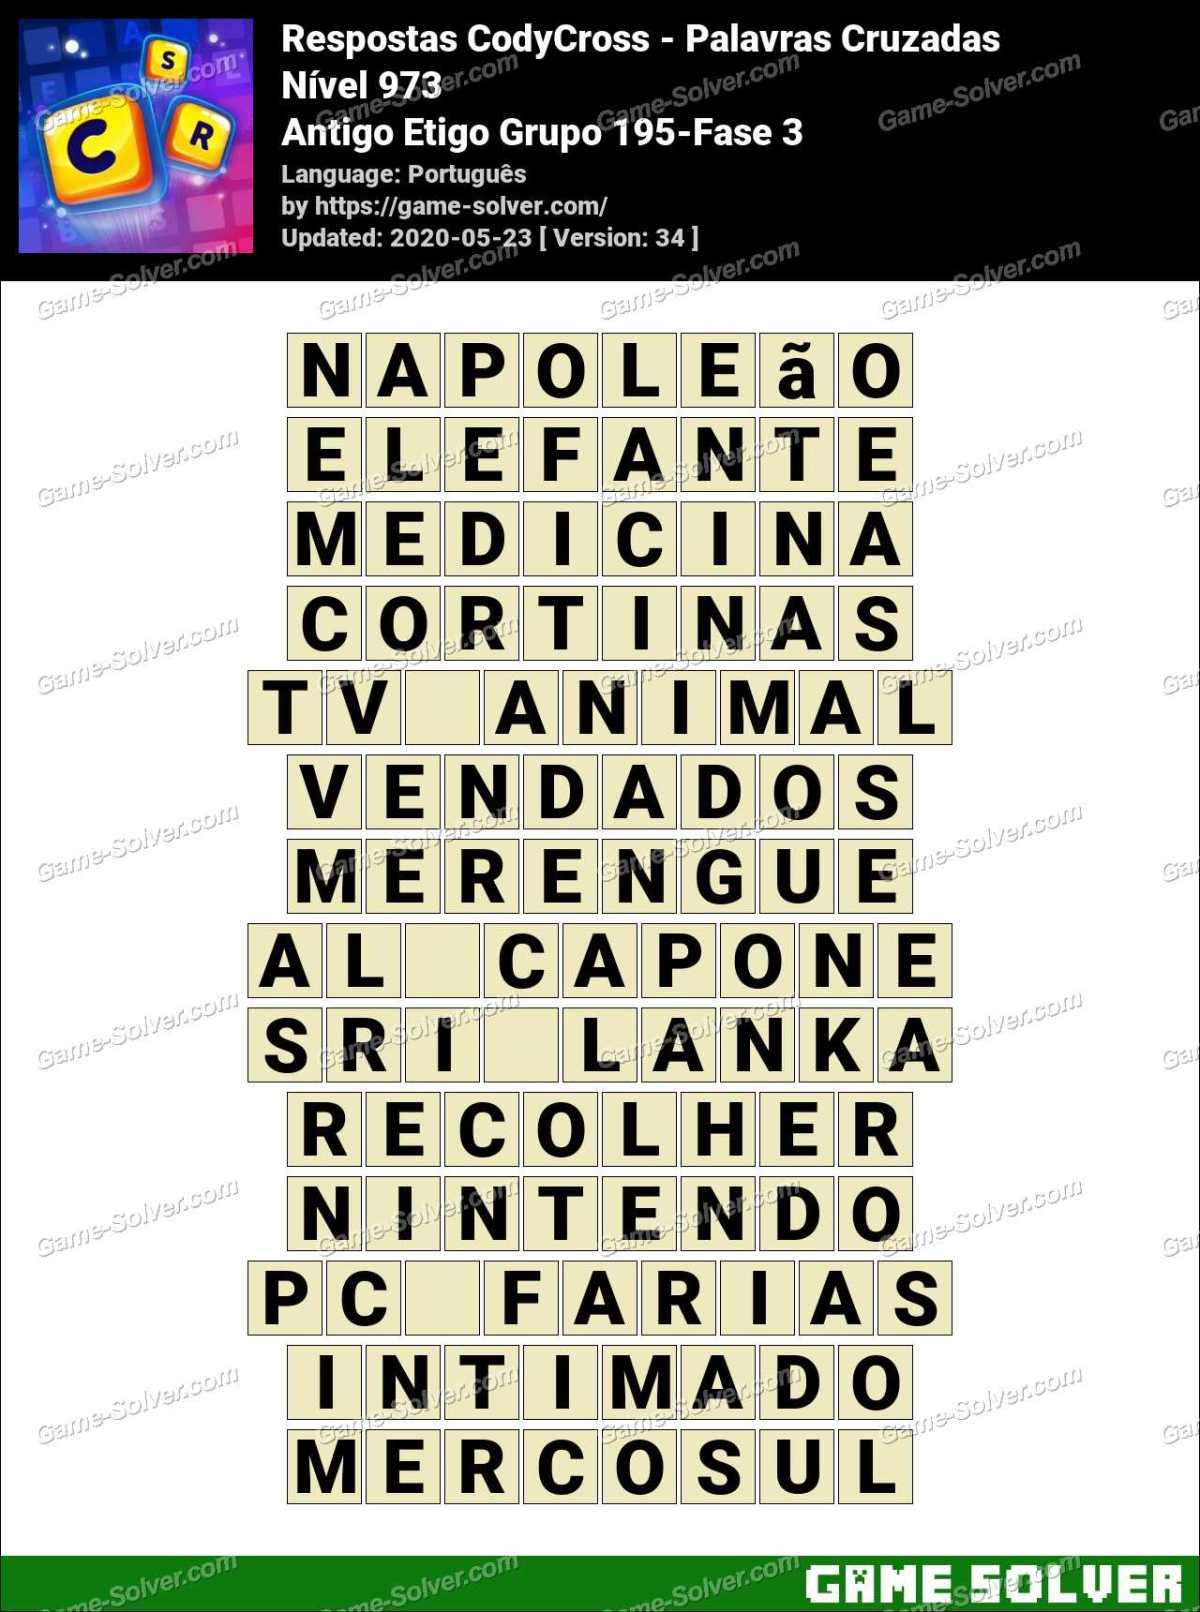 Respostas CodyCross Antigo Etigo Grupo 195-Fase 3